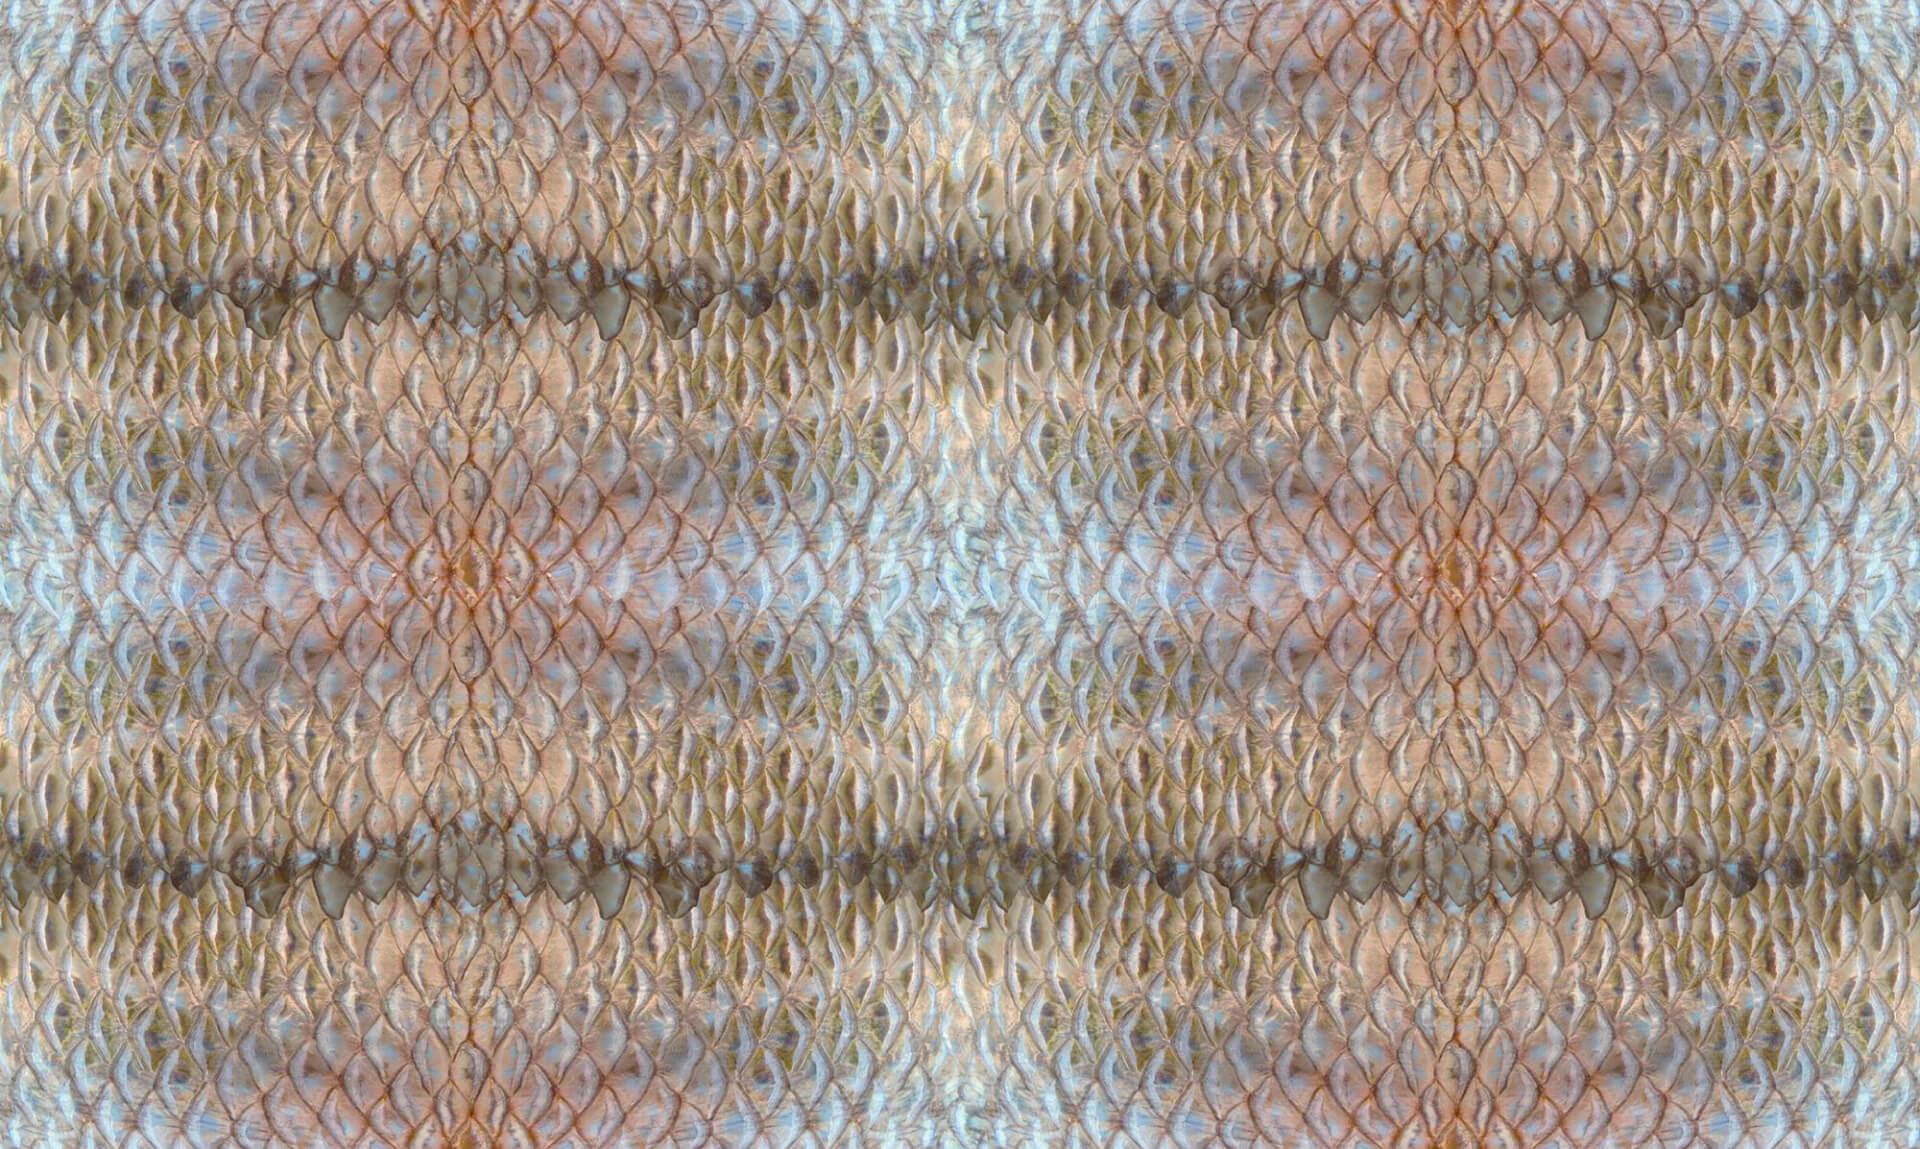 Dragon Scale / Margate BA1071 Doug Garrabrants